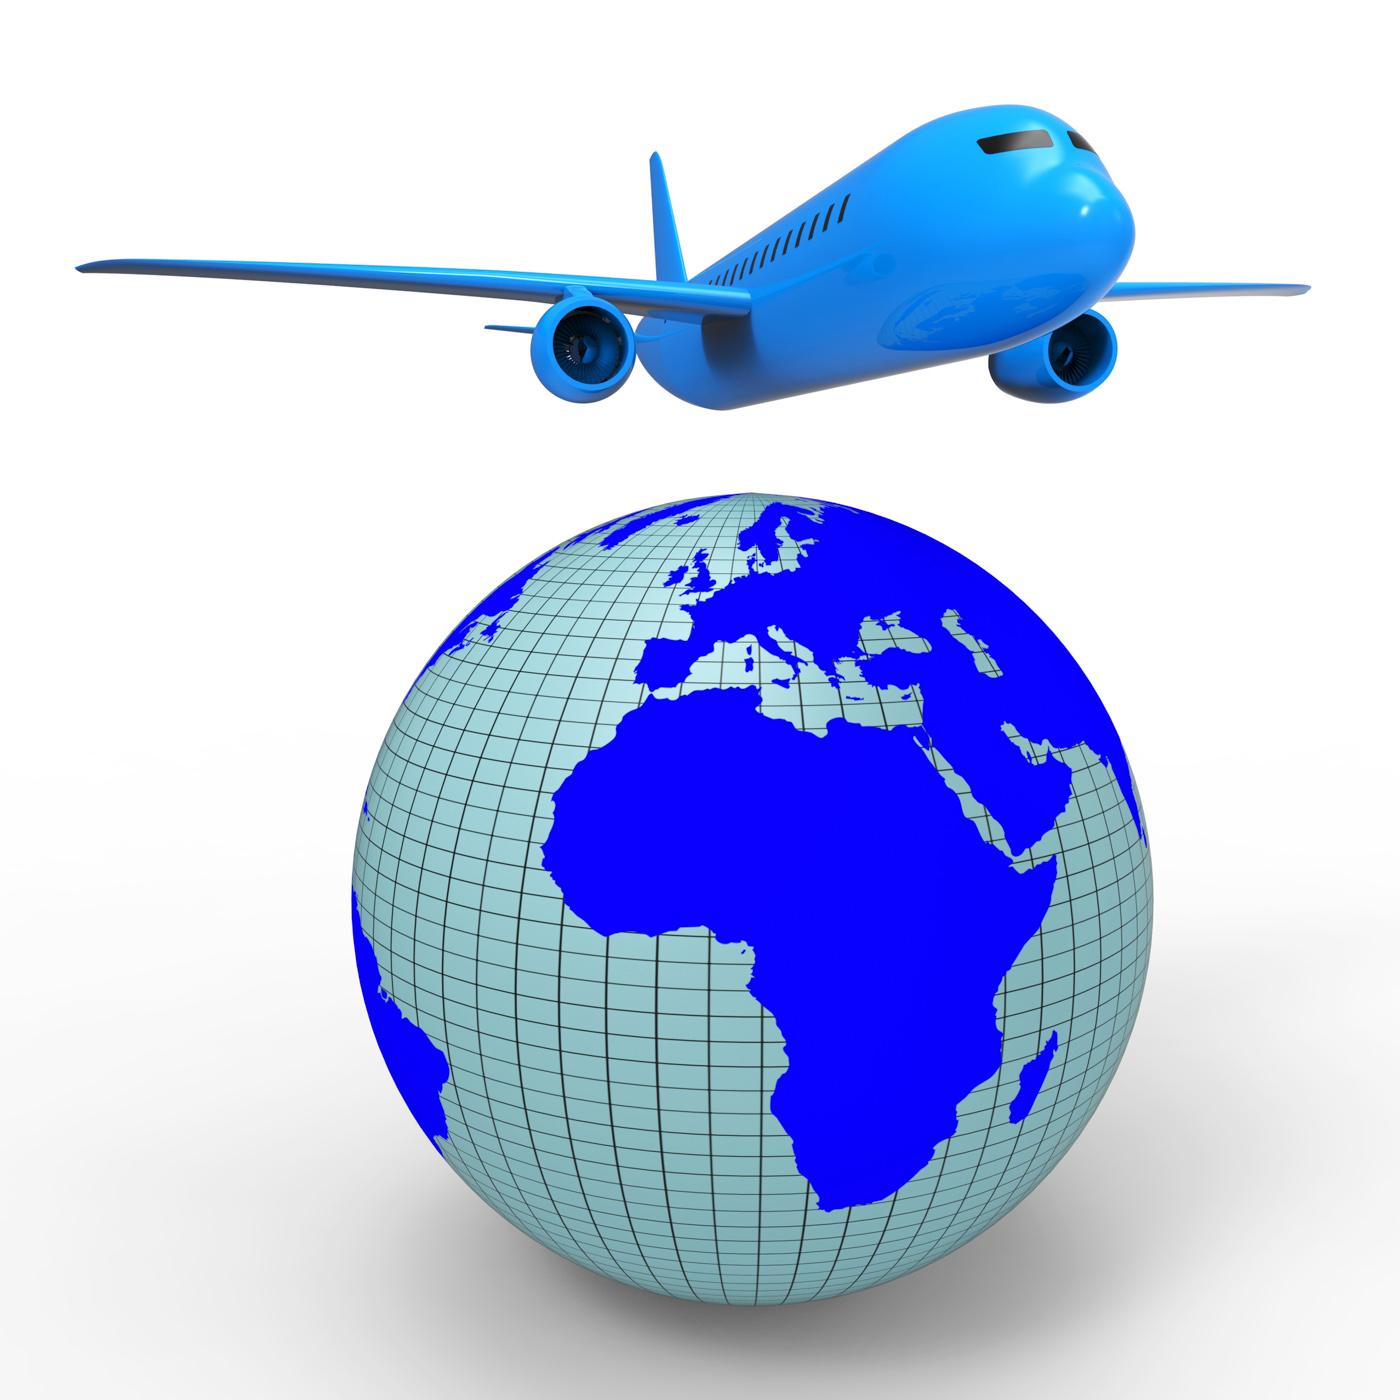 Worldwide travel shows aeroplane jet and planet photo